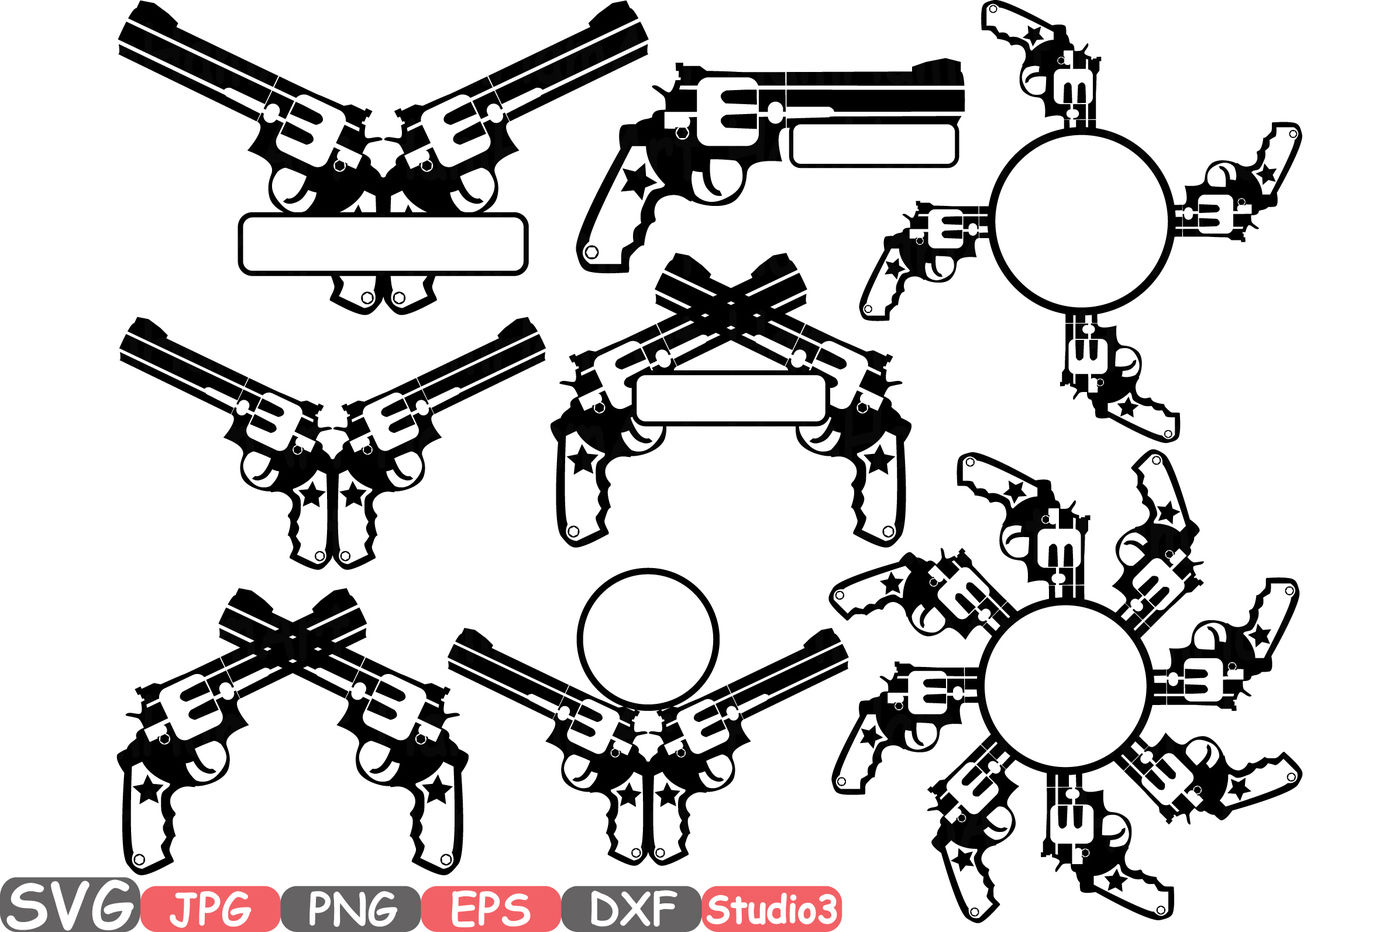 Guns Split Circle Ssvg Silhouette Cutting Files Cricut Studio3